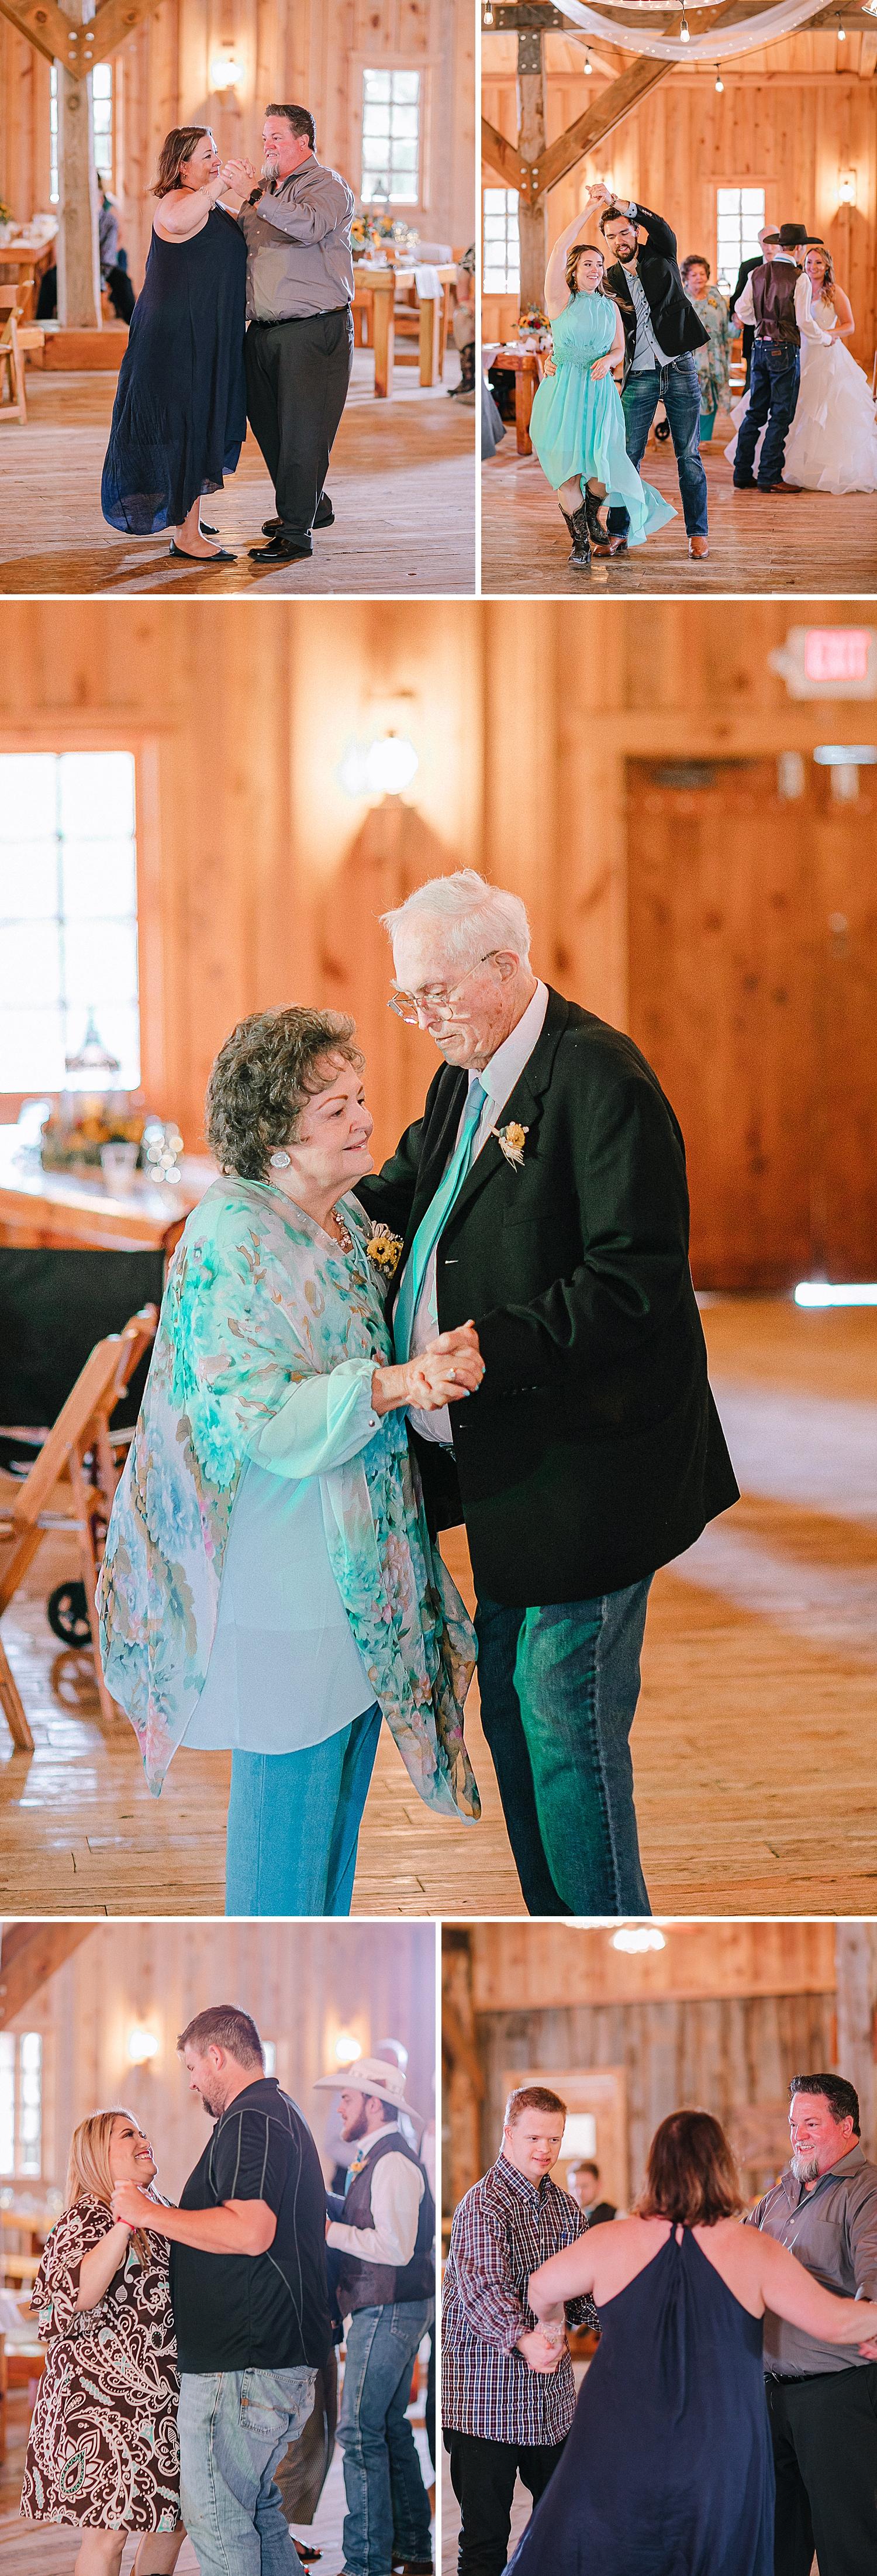 Carly-Barton-Photography-Old-Town-Texas-Rustic-Wedding-Photos-Sunflowers-Boots-Kyle-Texas_0091.jpg